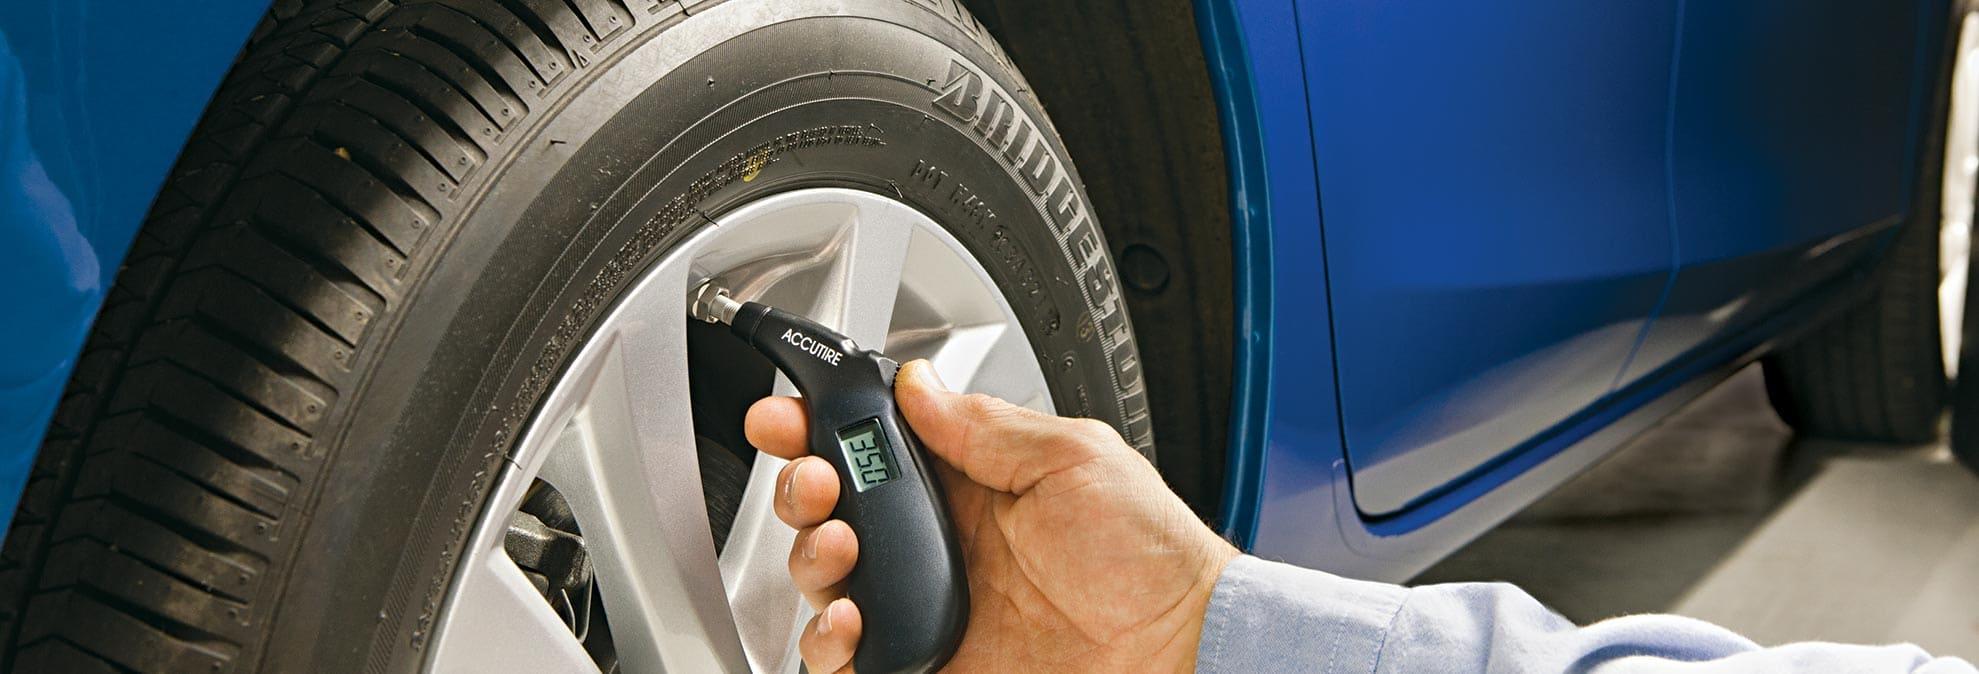 9a43c42d0da Tire Safety Checklist